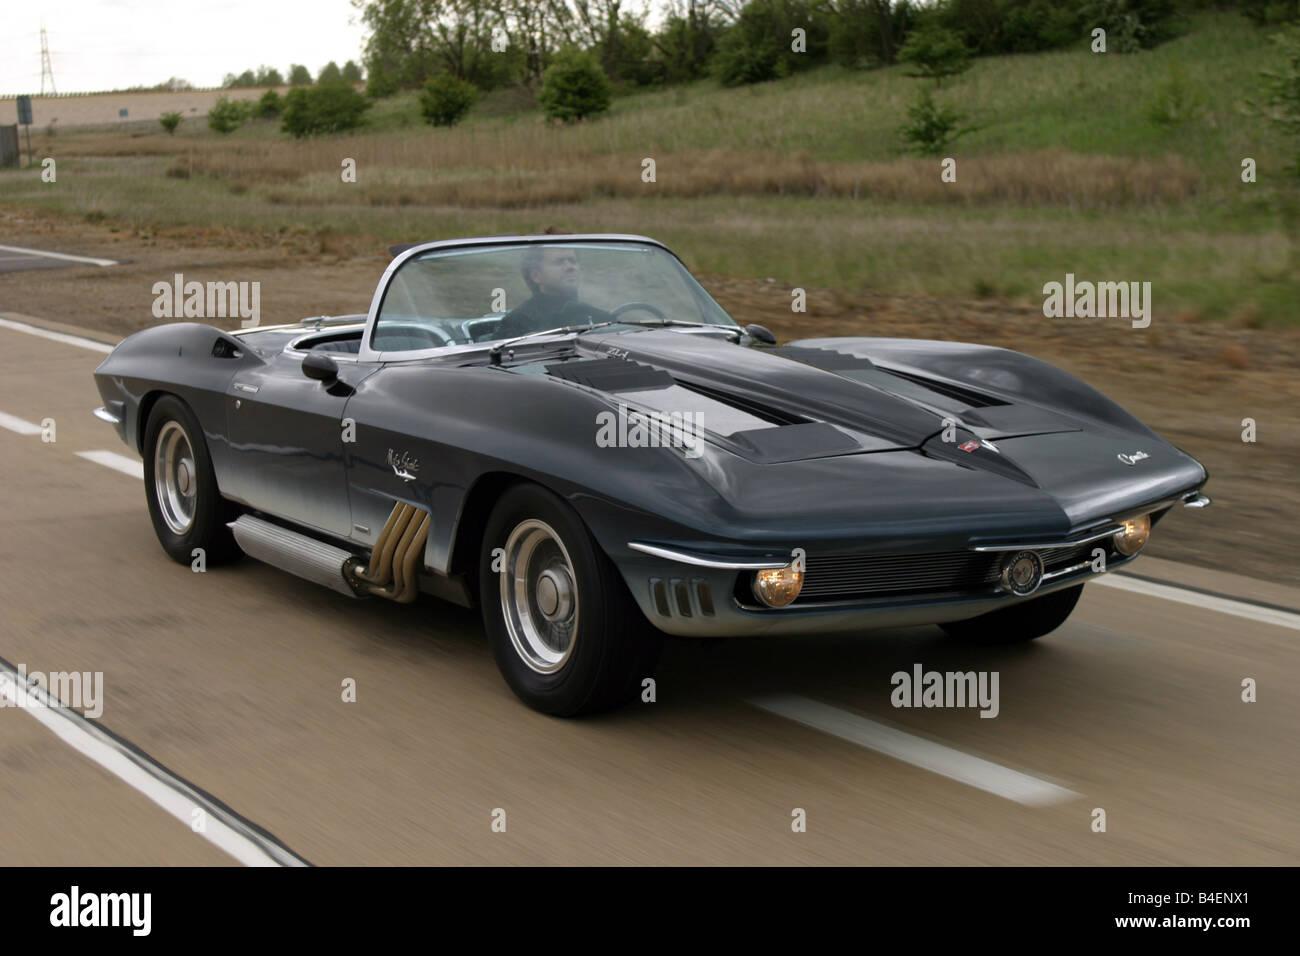 Image 20 Of 50 Fab Wheels Digest Fwd 1961 Chevrolet Mako Shark Chevy Corvette Stingray Car Model Year